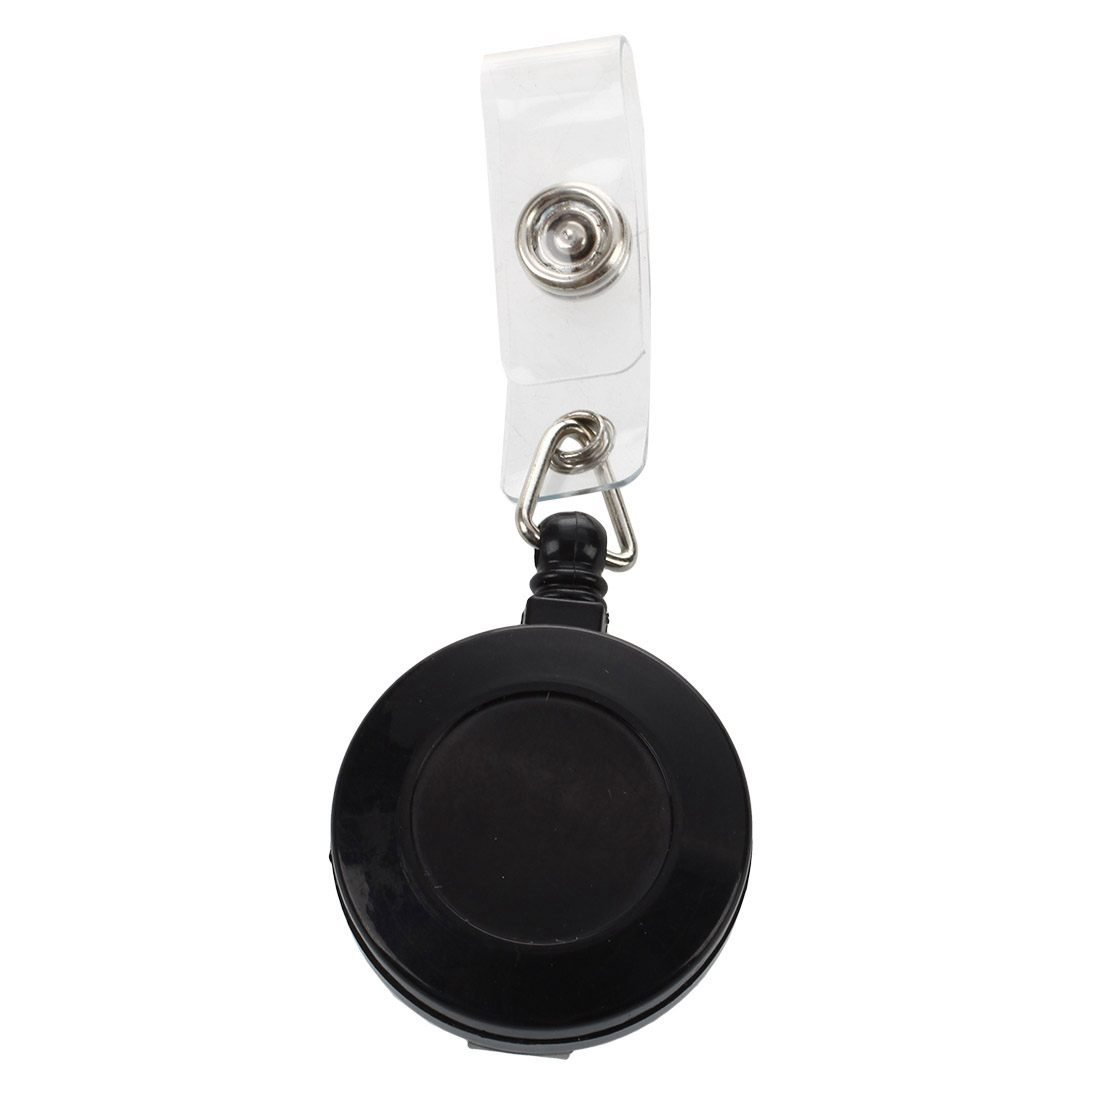 1 Pcs Badge Holder Retractable Reel YOYO Clip Snap Button ID Card Key Black